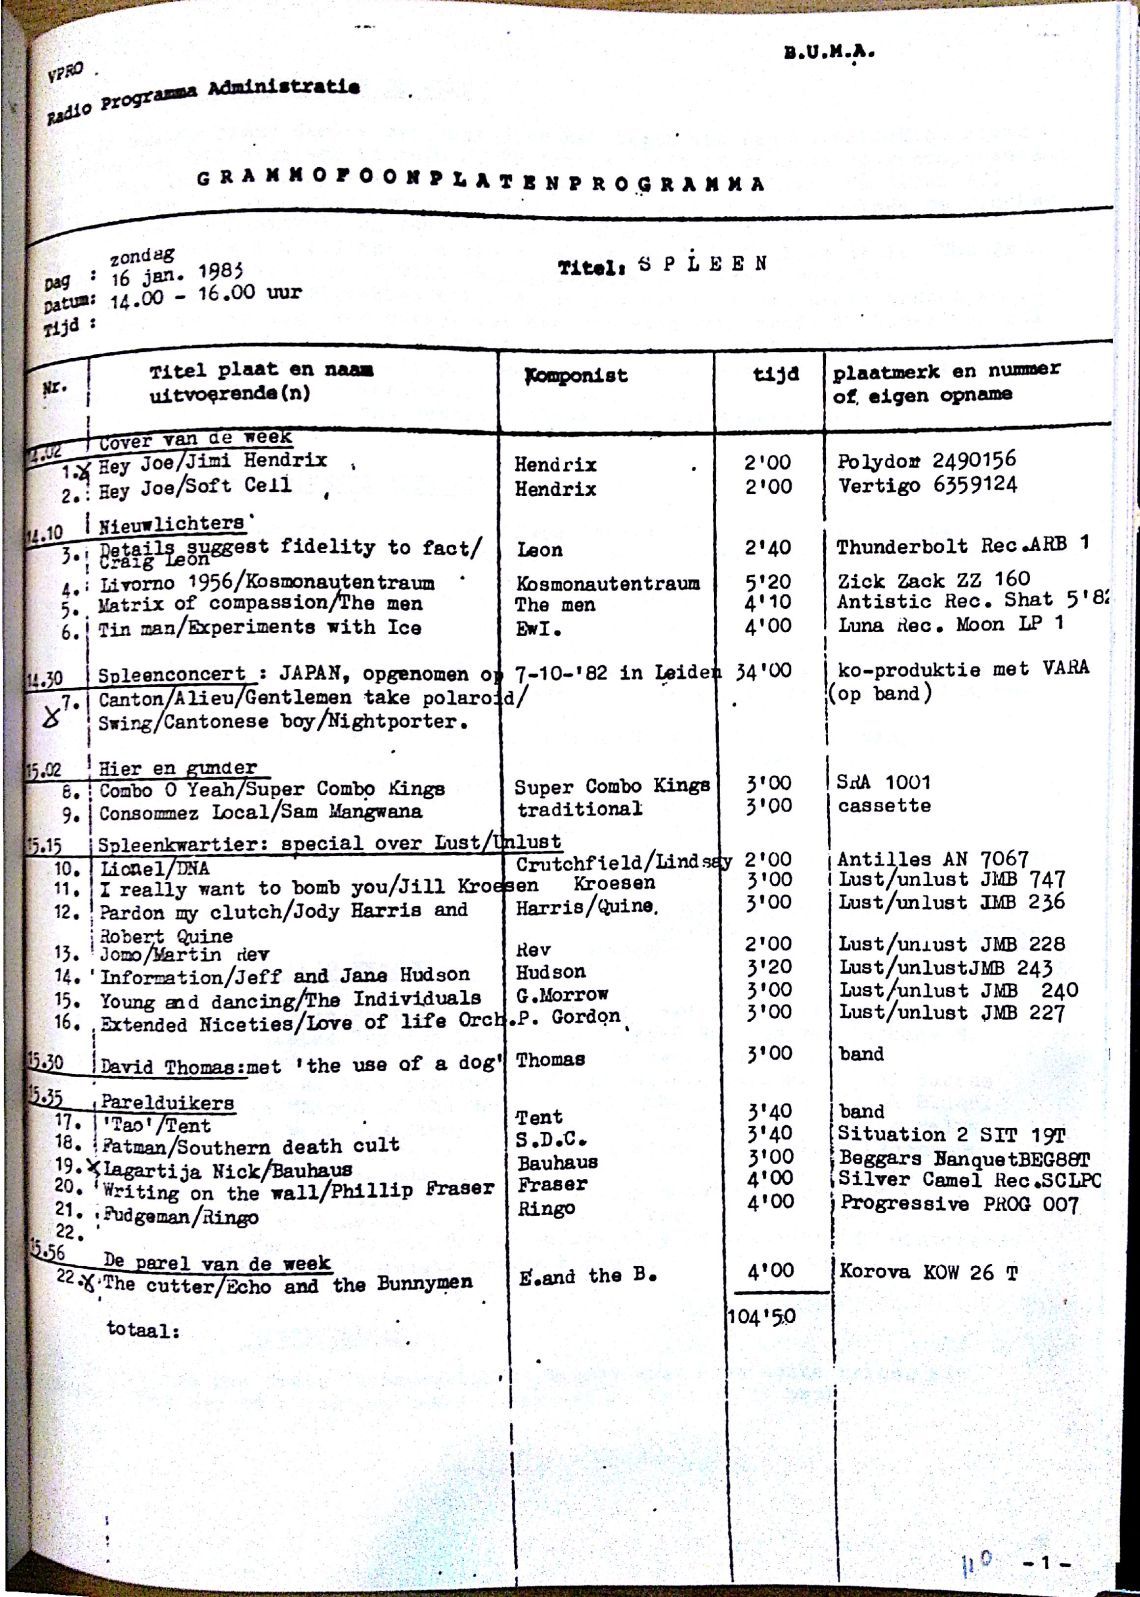 SPLEEN 16 Januari 1983